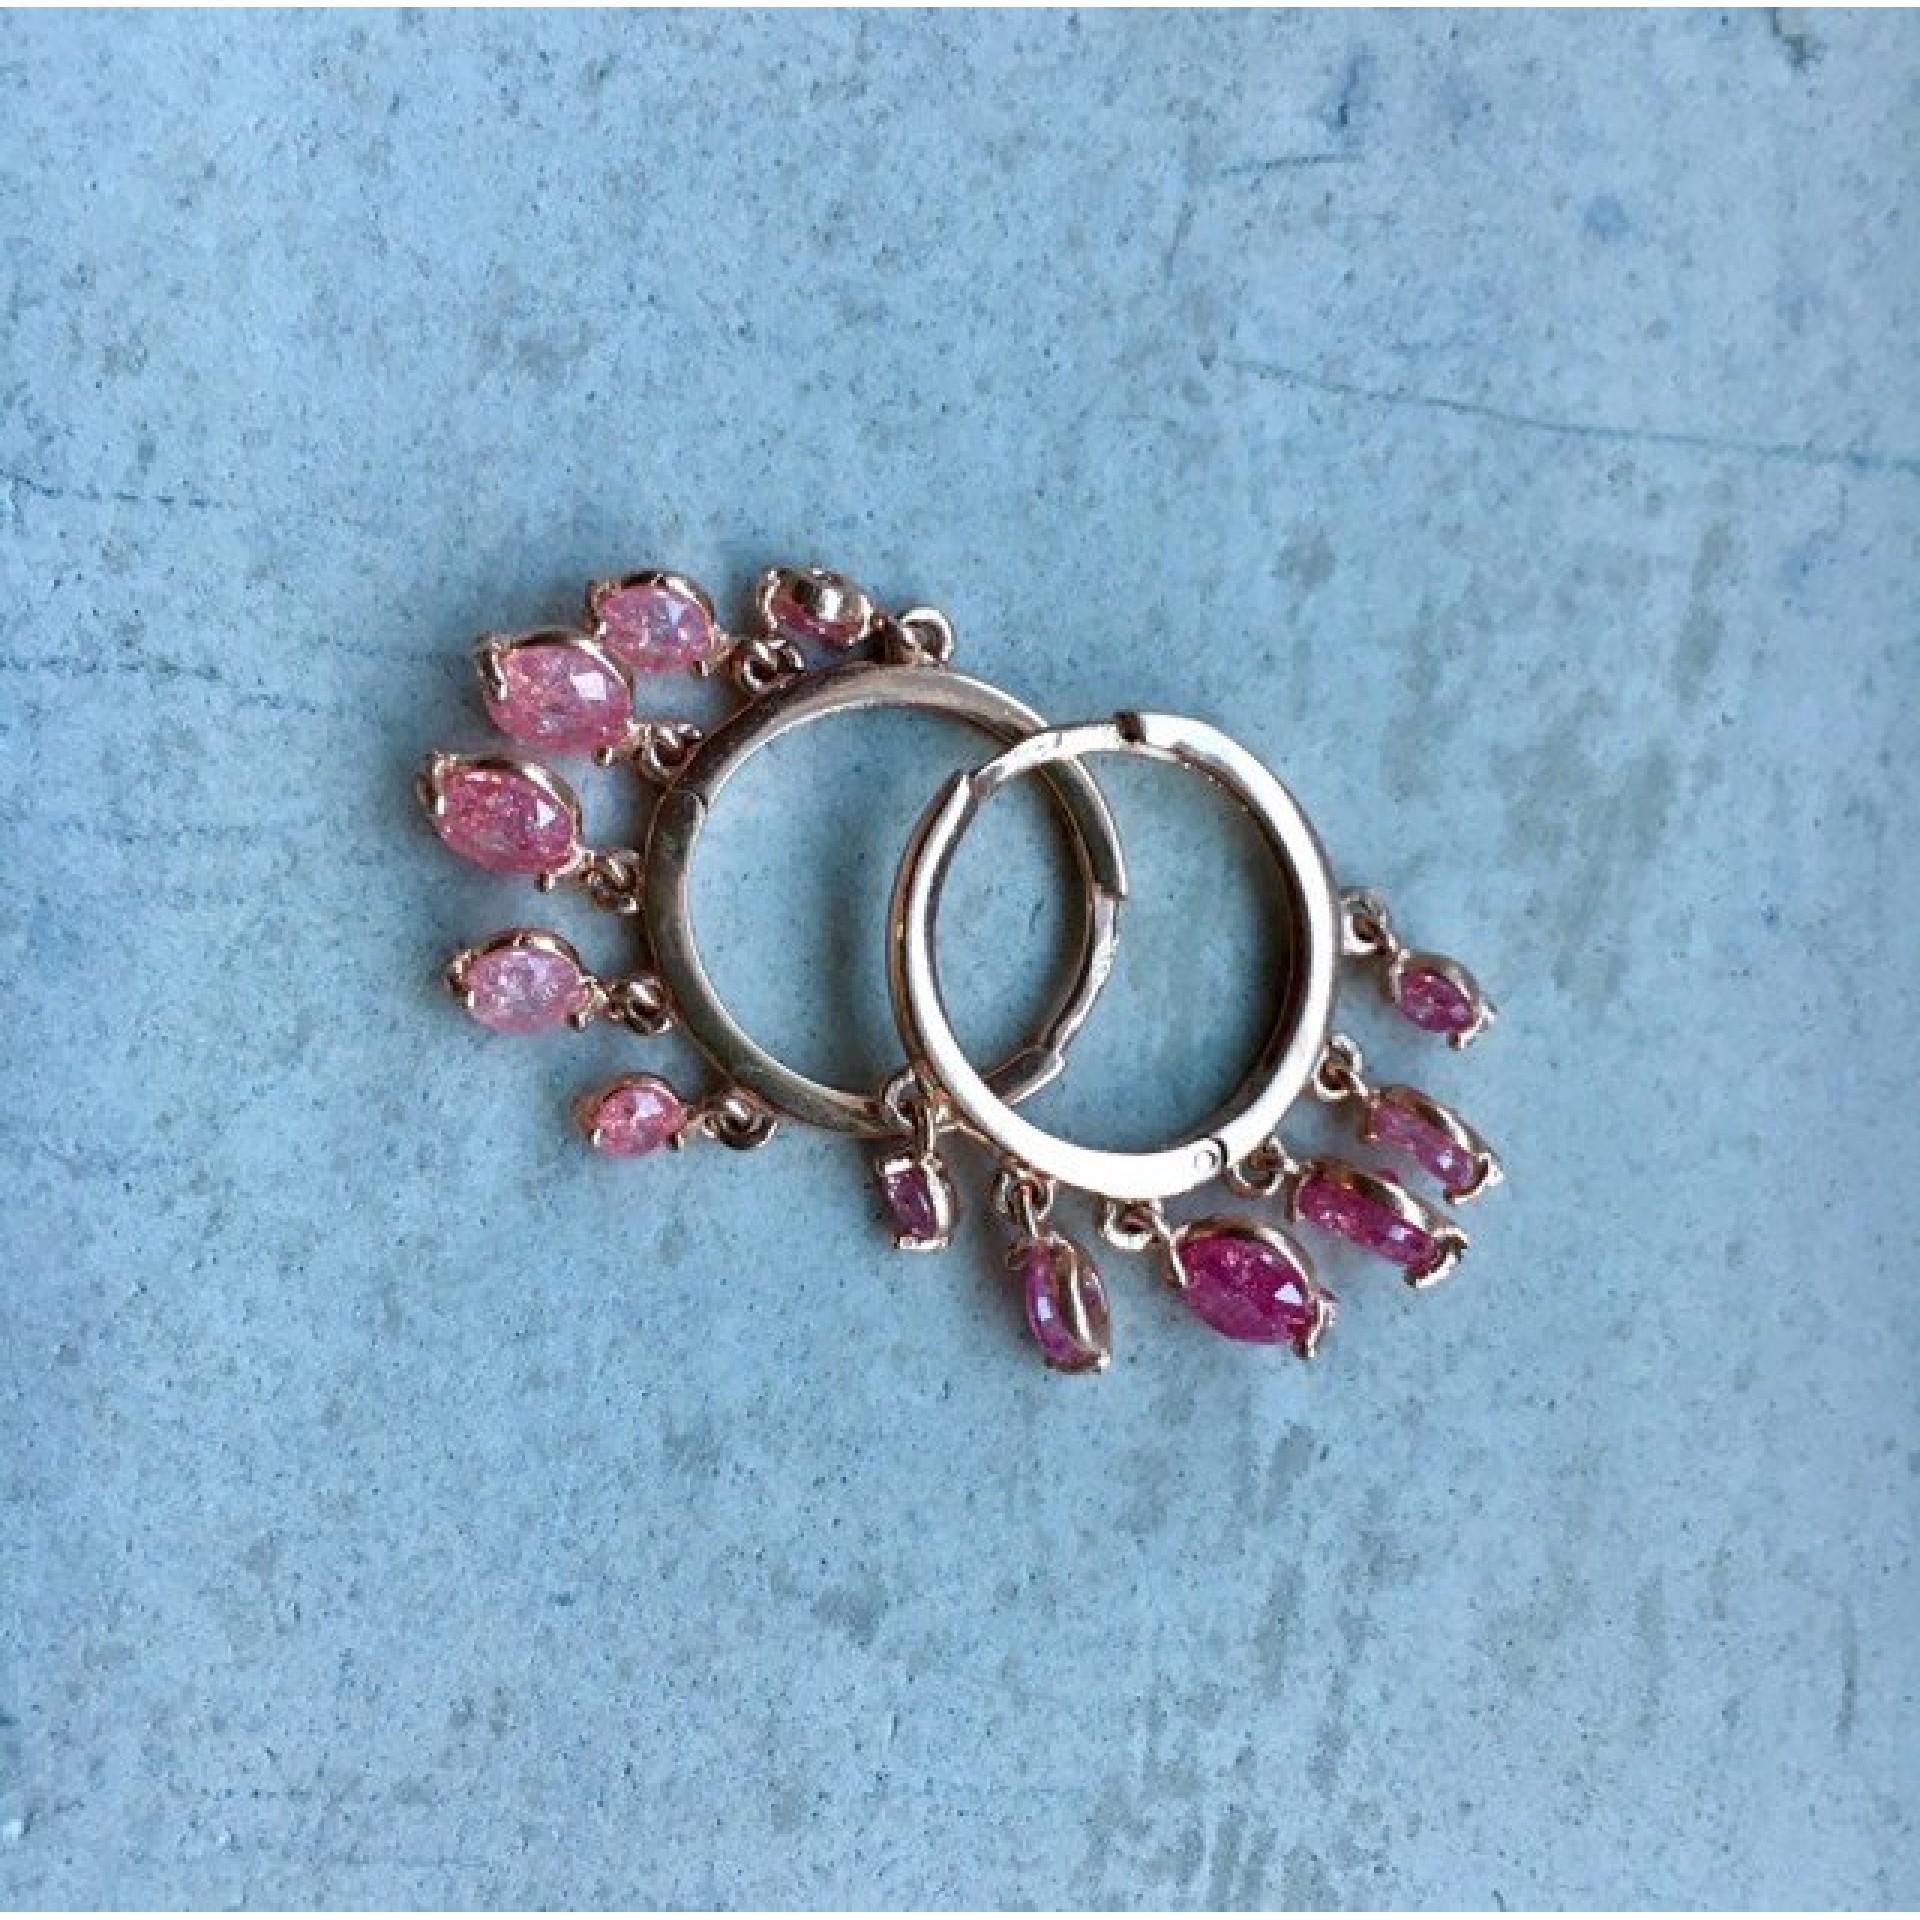 The Rose's silver earrings